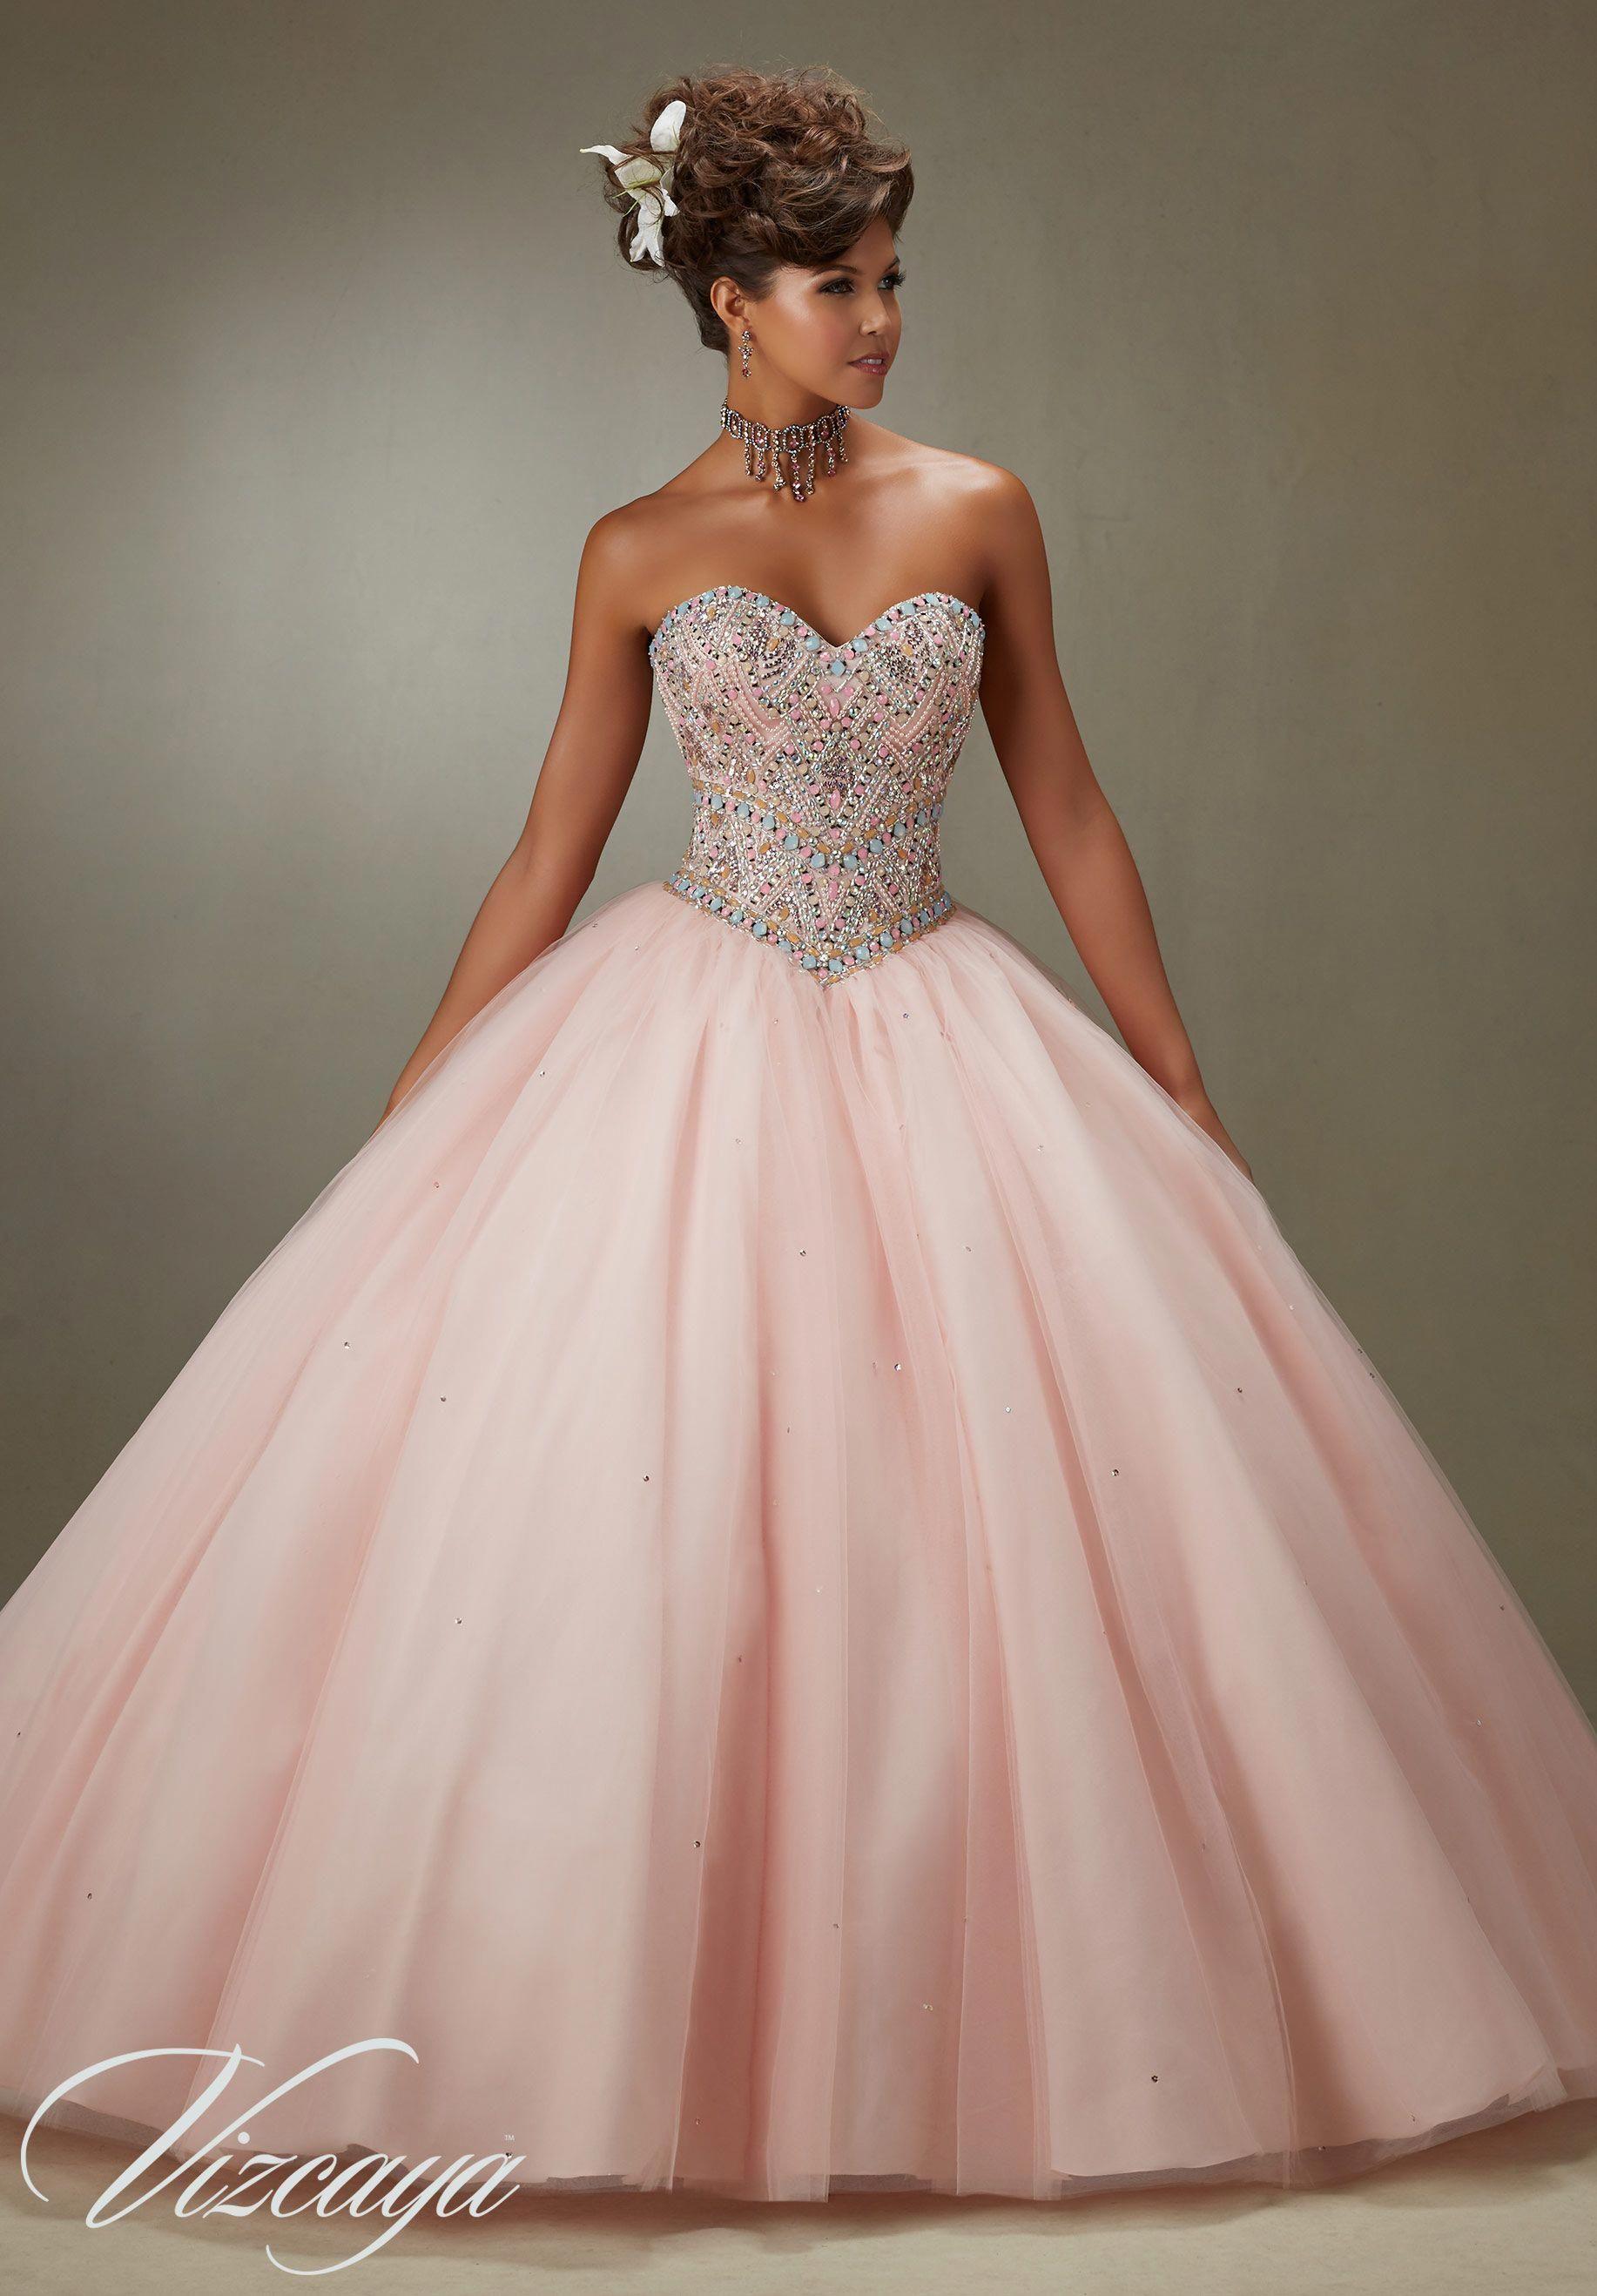 Quinceanera Dresses by Morilee designed by Madeline Gardner Sugar